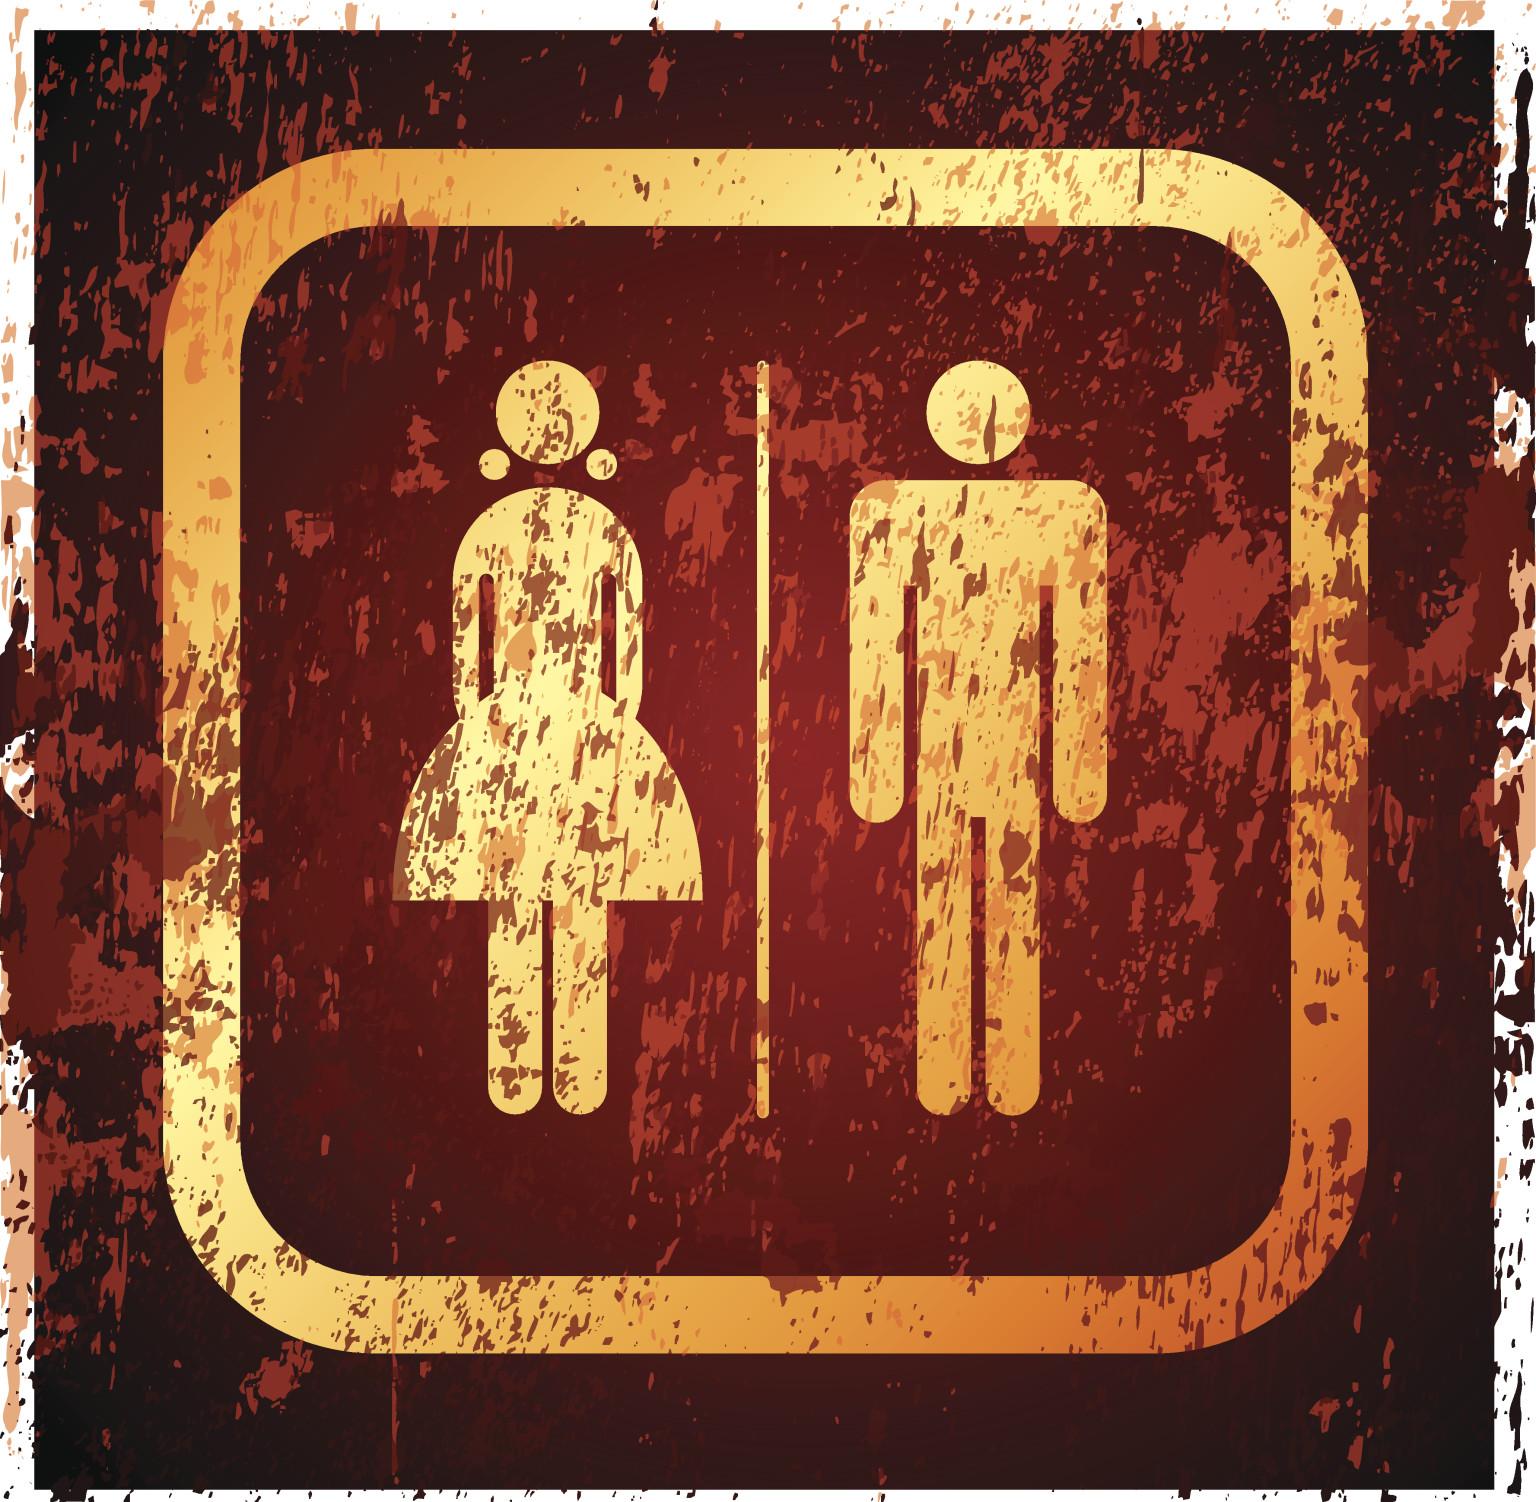 Zombie Bathroom Signs zombie bathroom sign